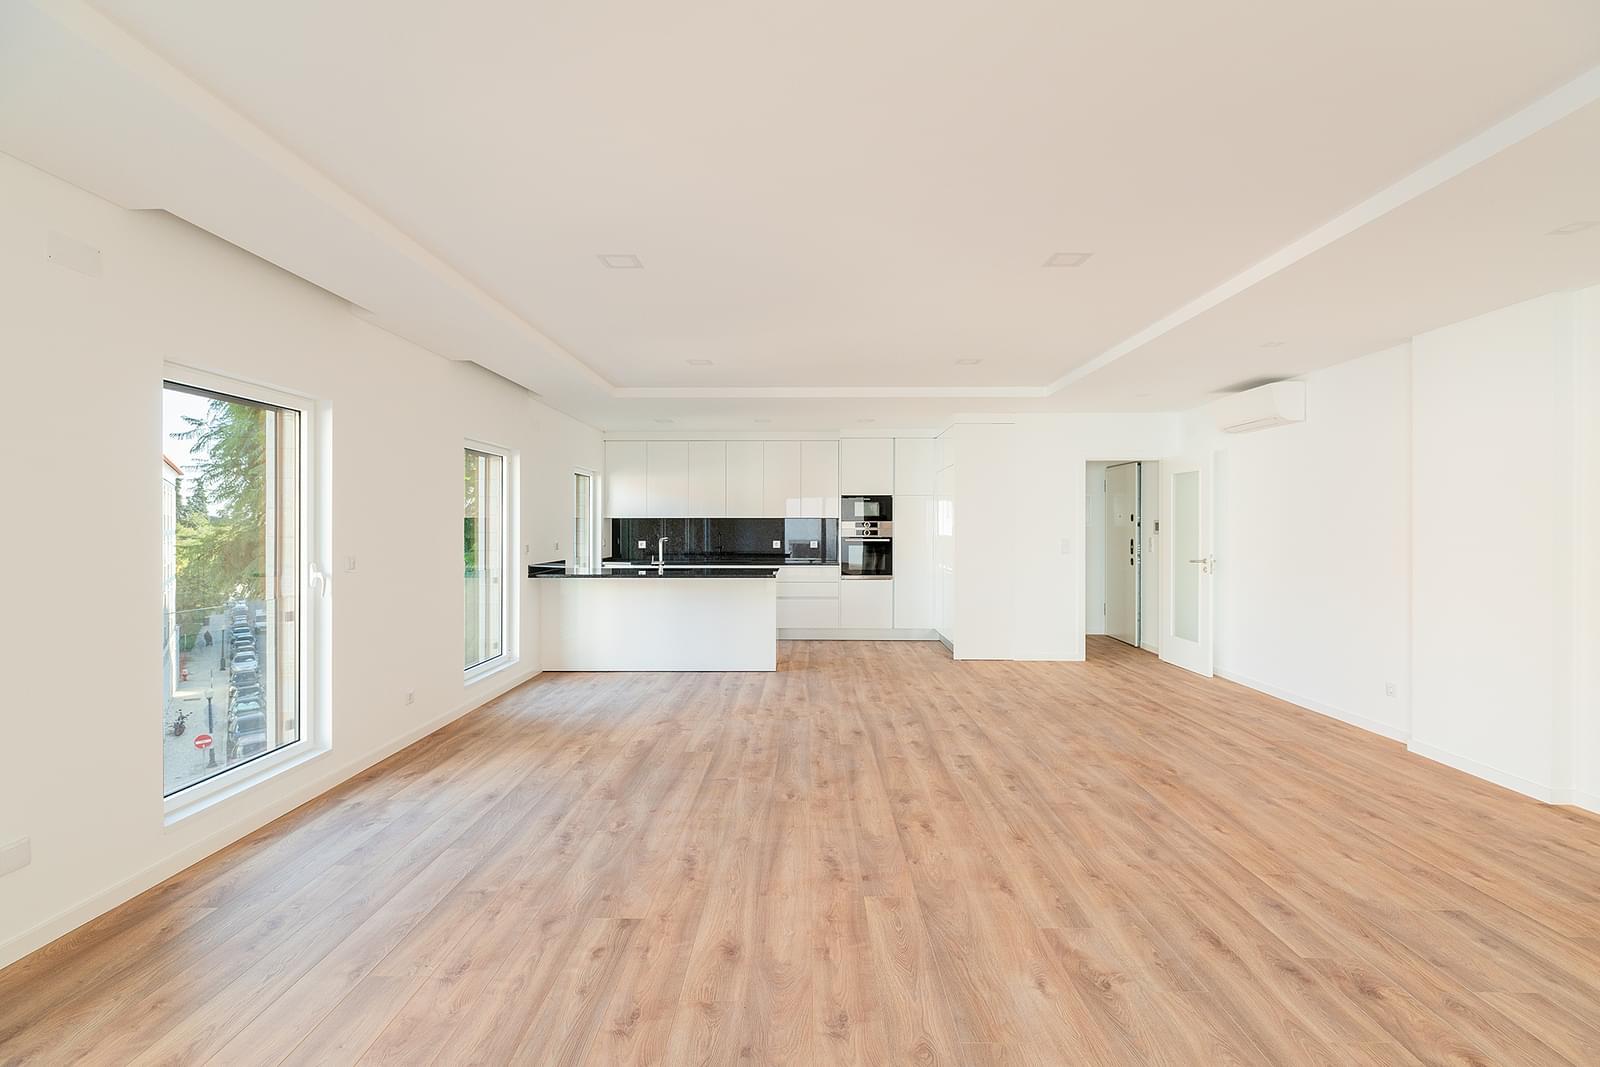 pf16829-apartamento-t1-lisboa-9201f942-be49-45ad-a0e7-6ec05e483cd6